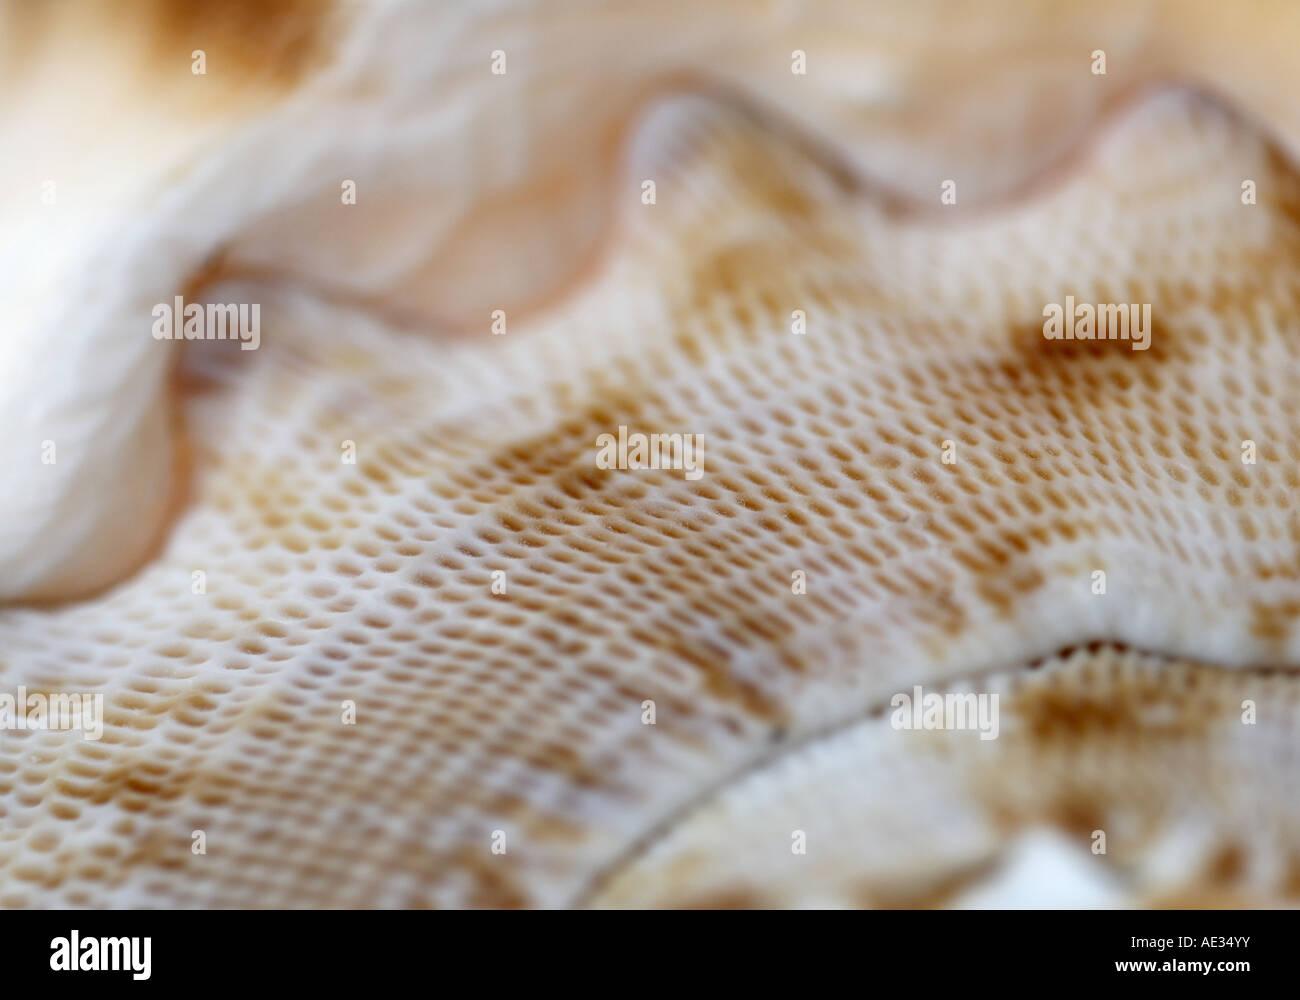 Marco of a Helmet seashell Stock Photo: 13552334 - Alamy